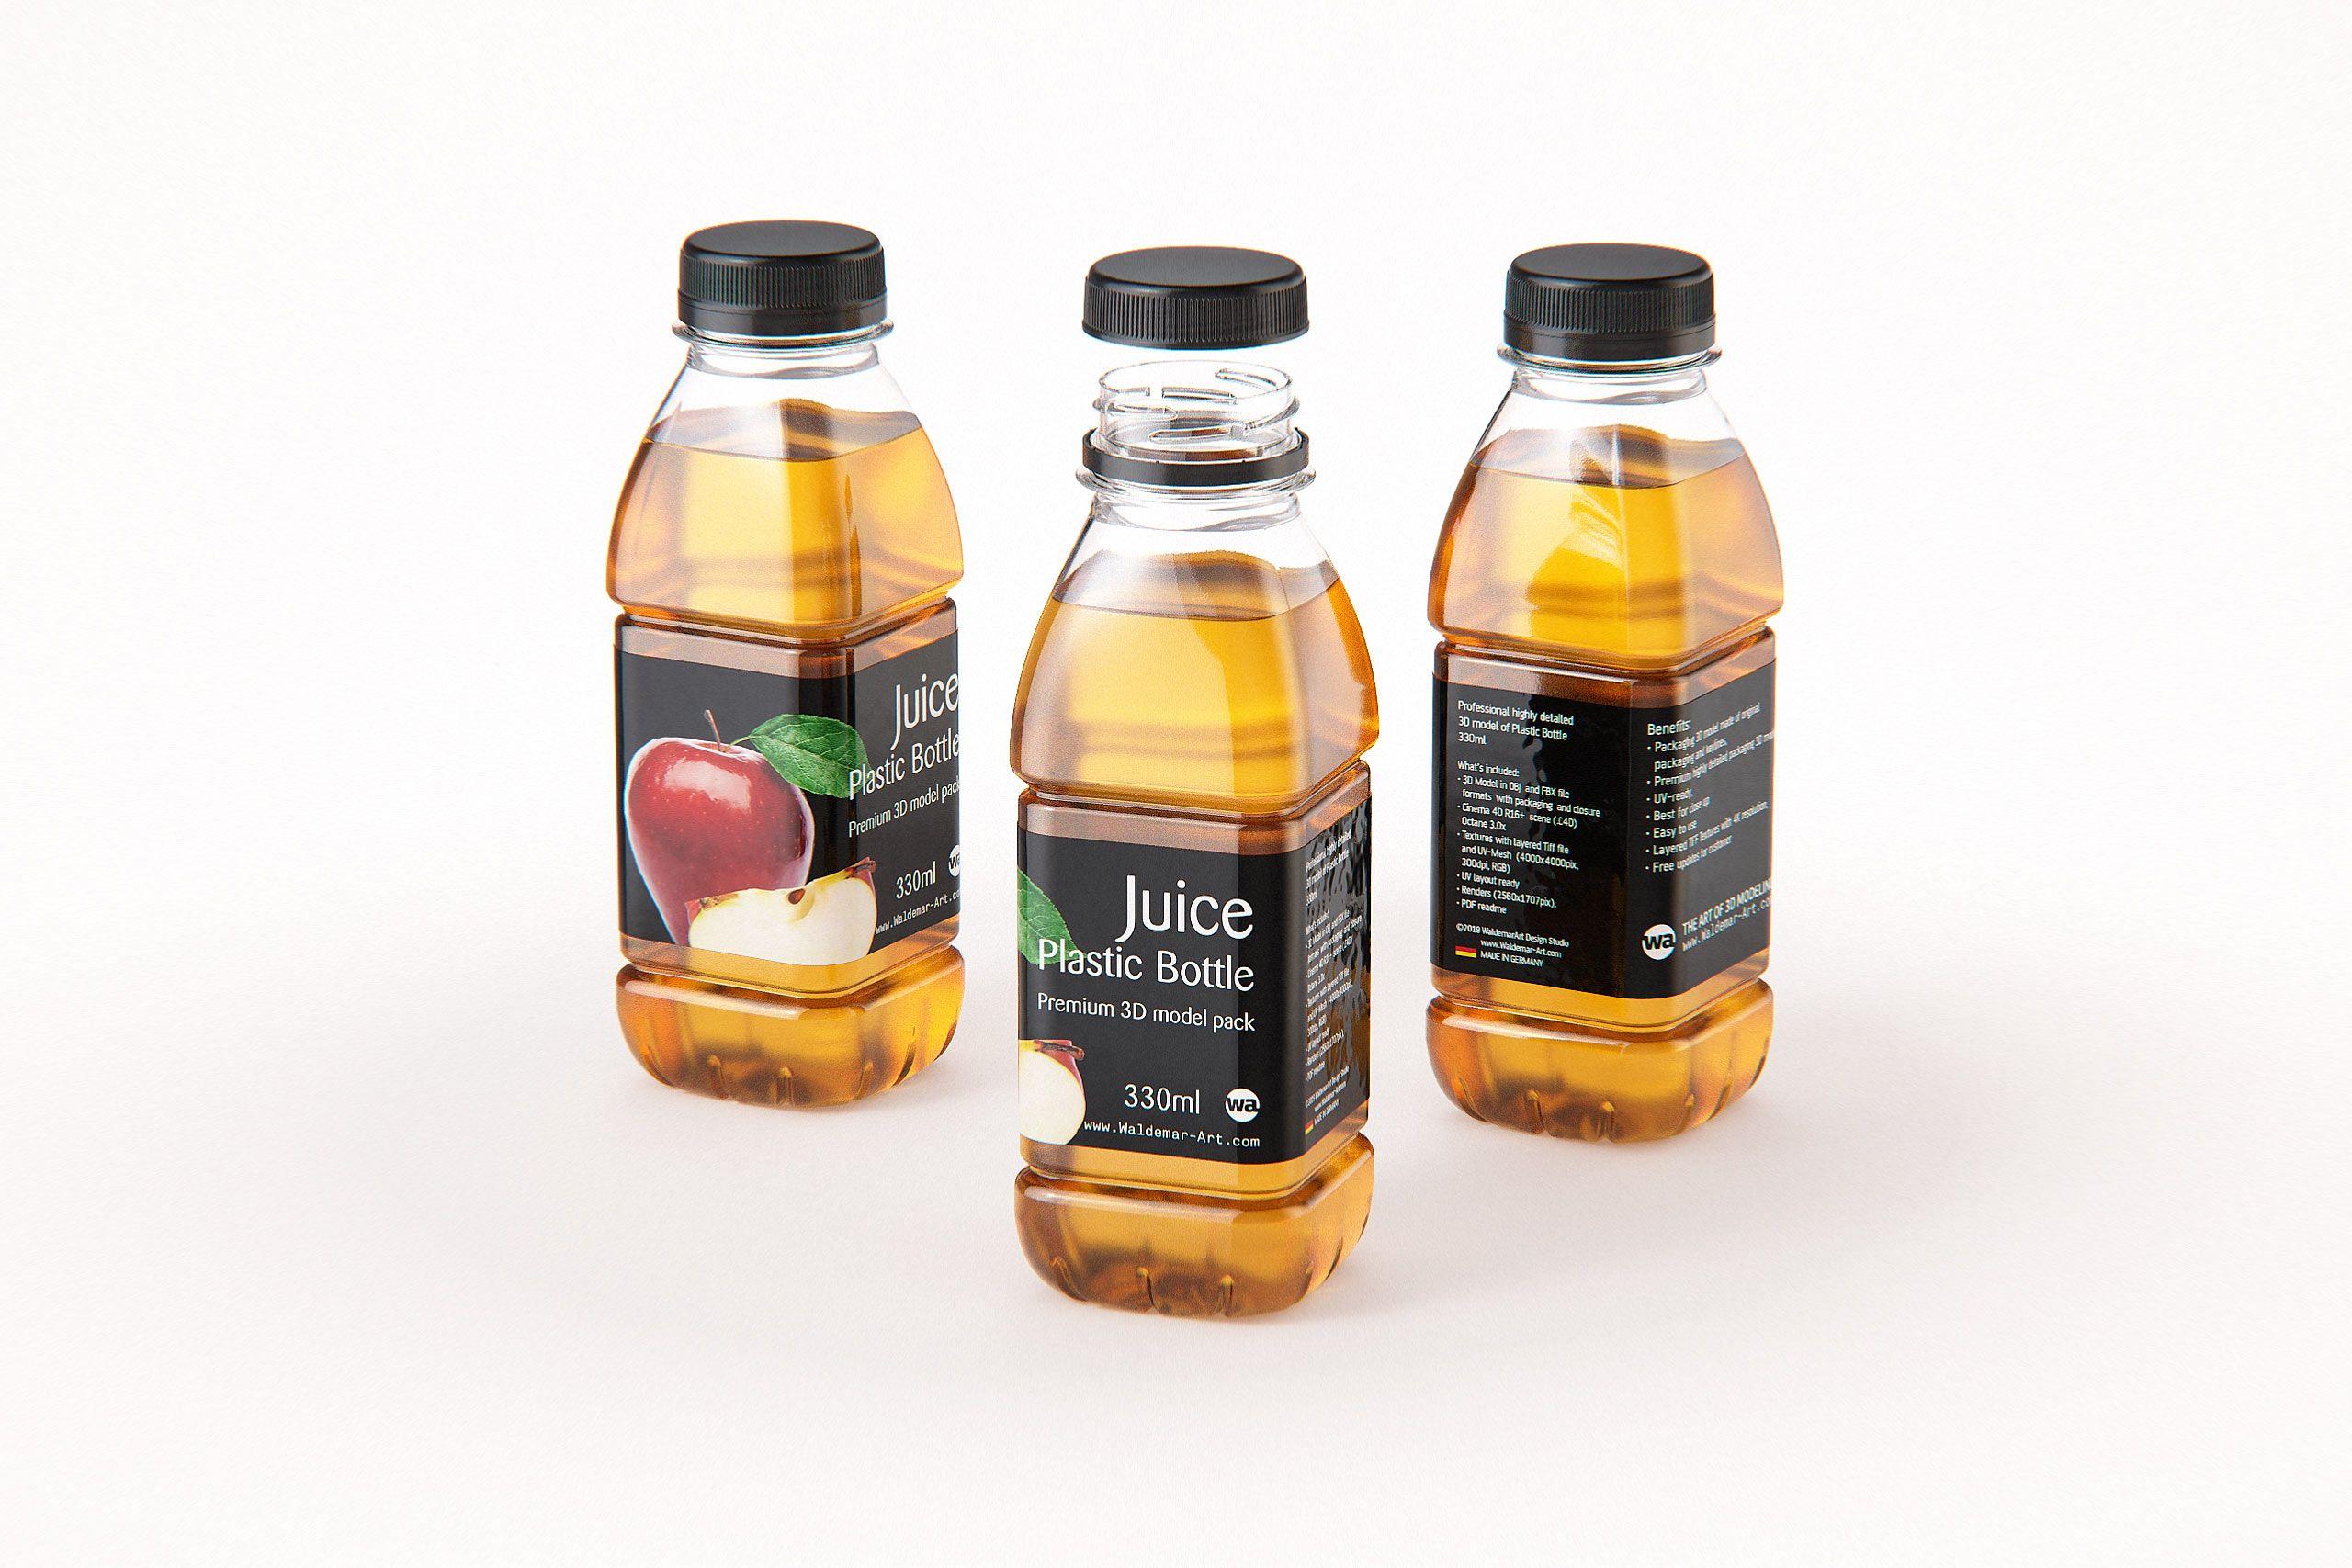 Juice Plastic Bottle 330ml Premium 3D model pack in 2020